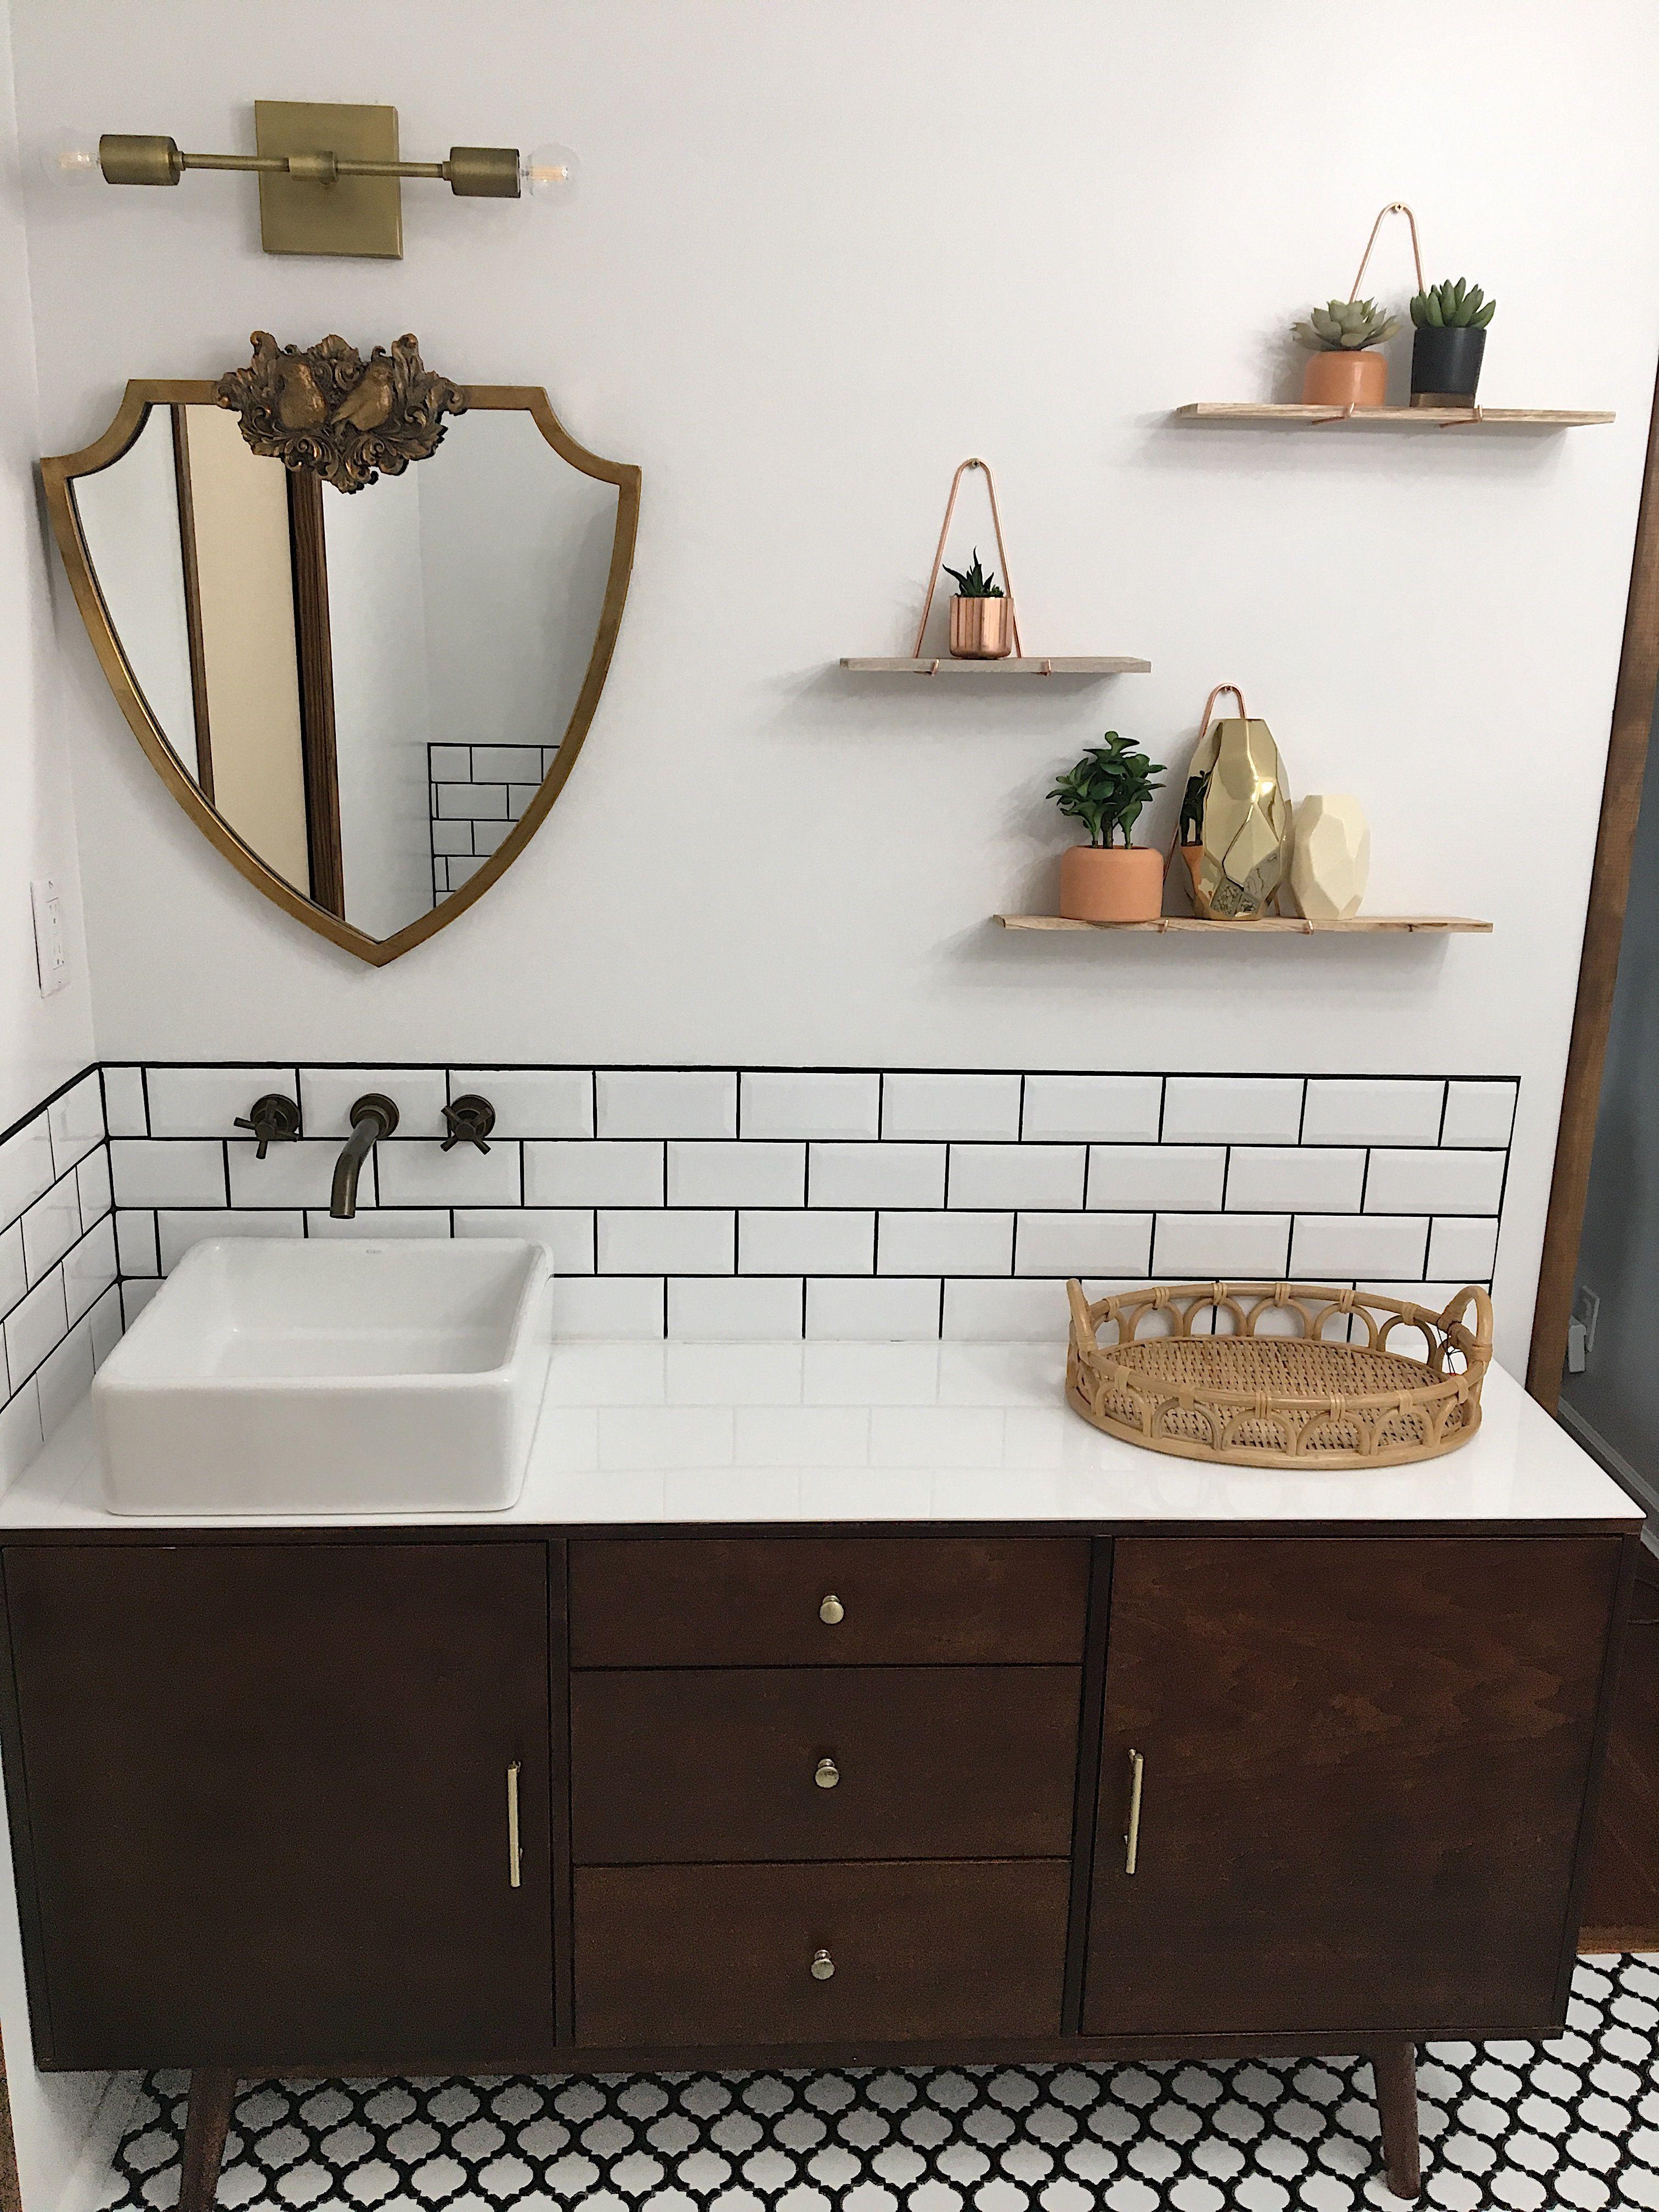 Bathroom Renovations Master Bathroom Mid Century Master Bath Me val Bathroom